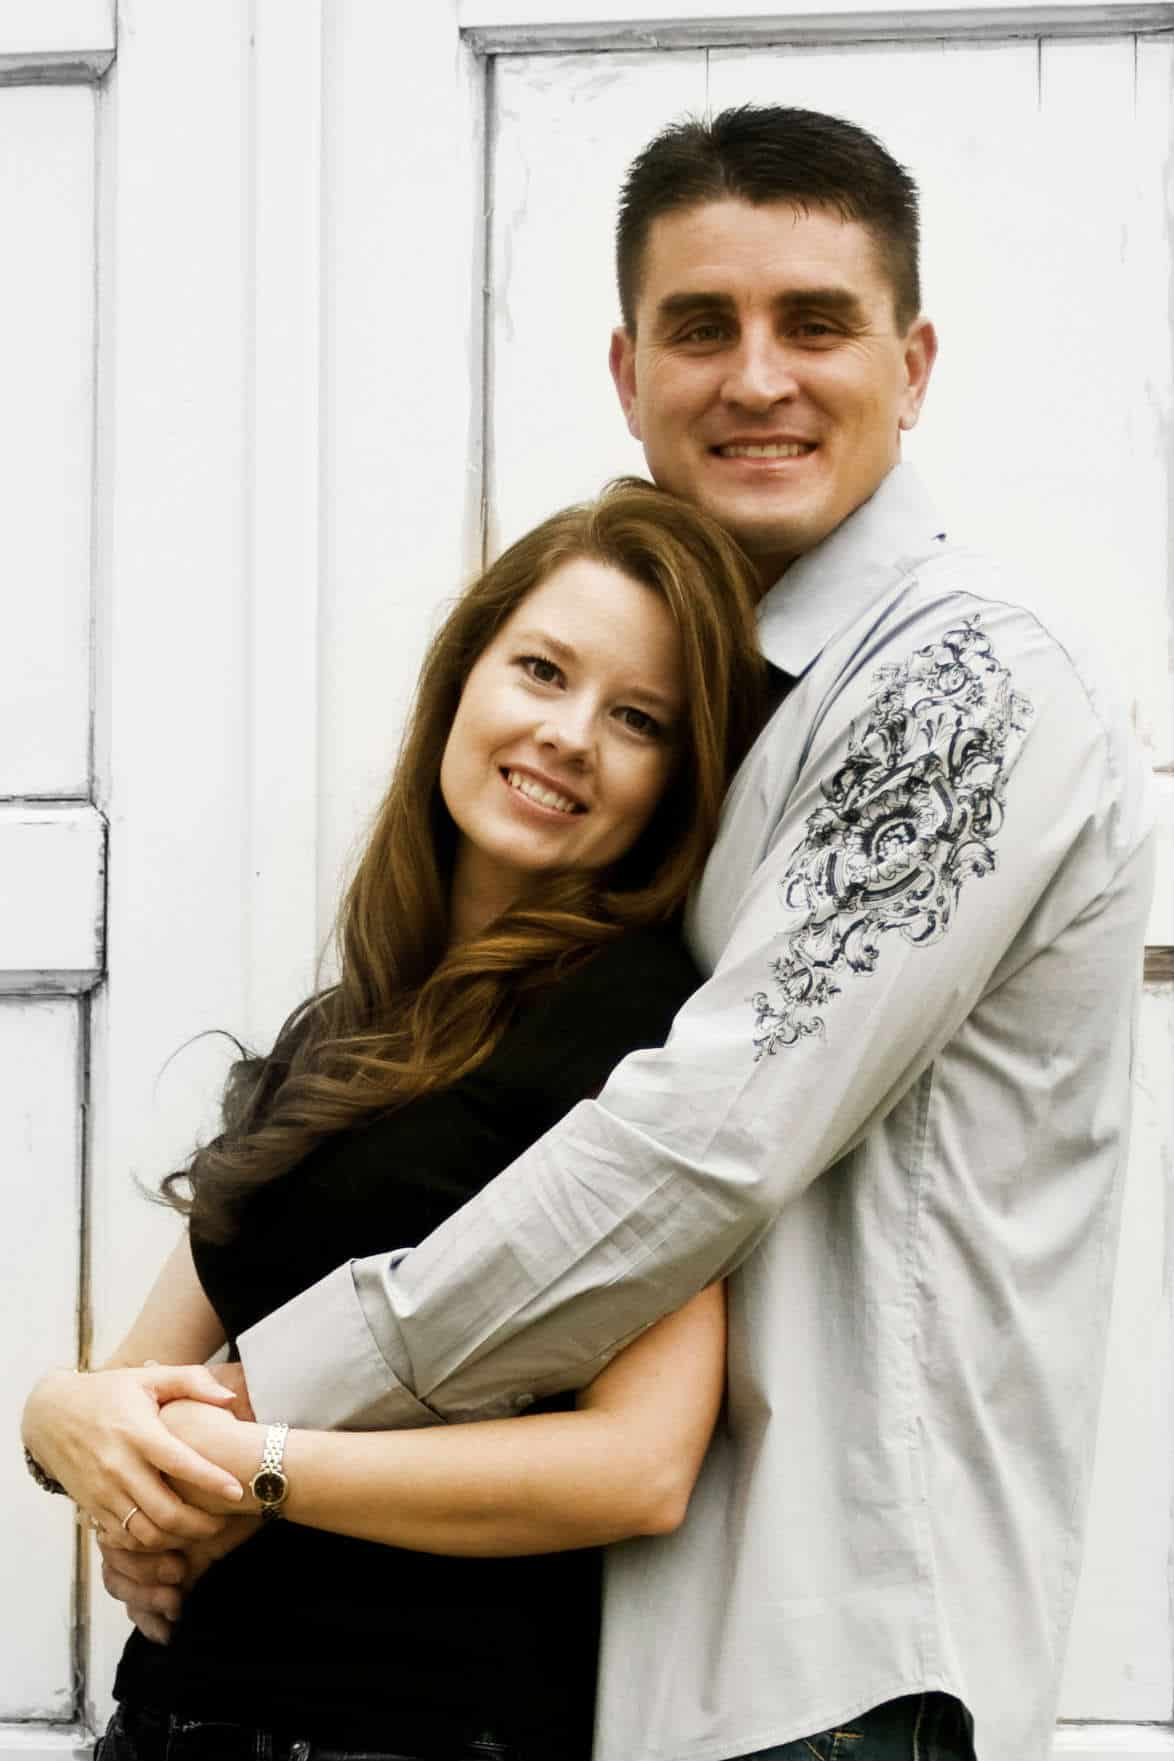 My Husband Aaron and I